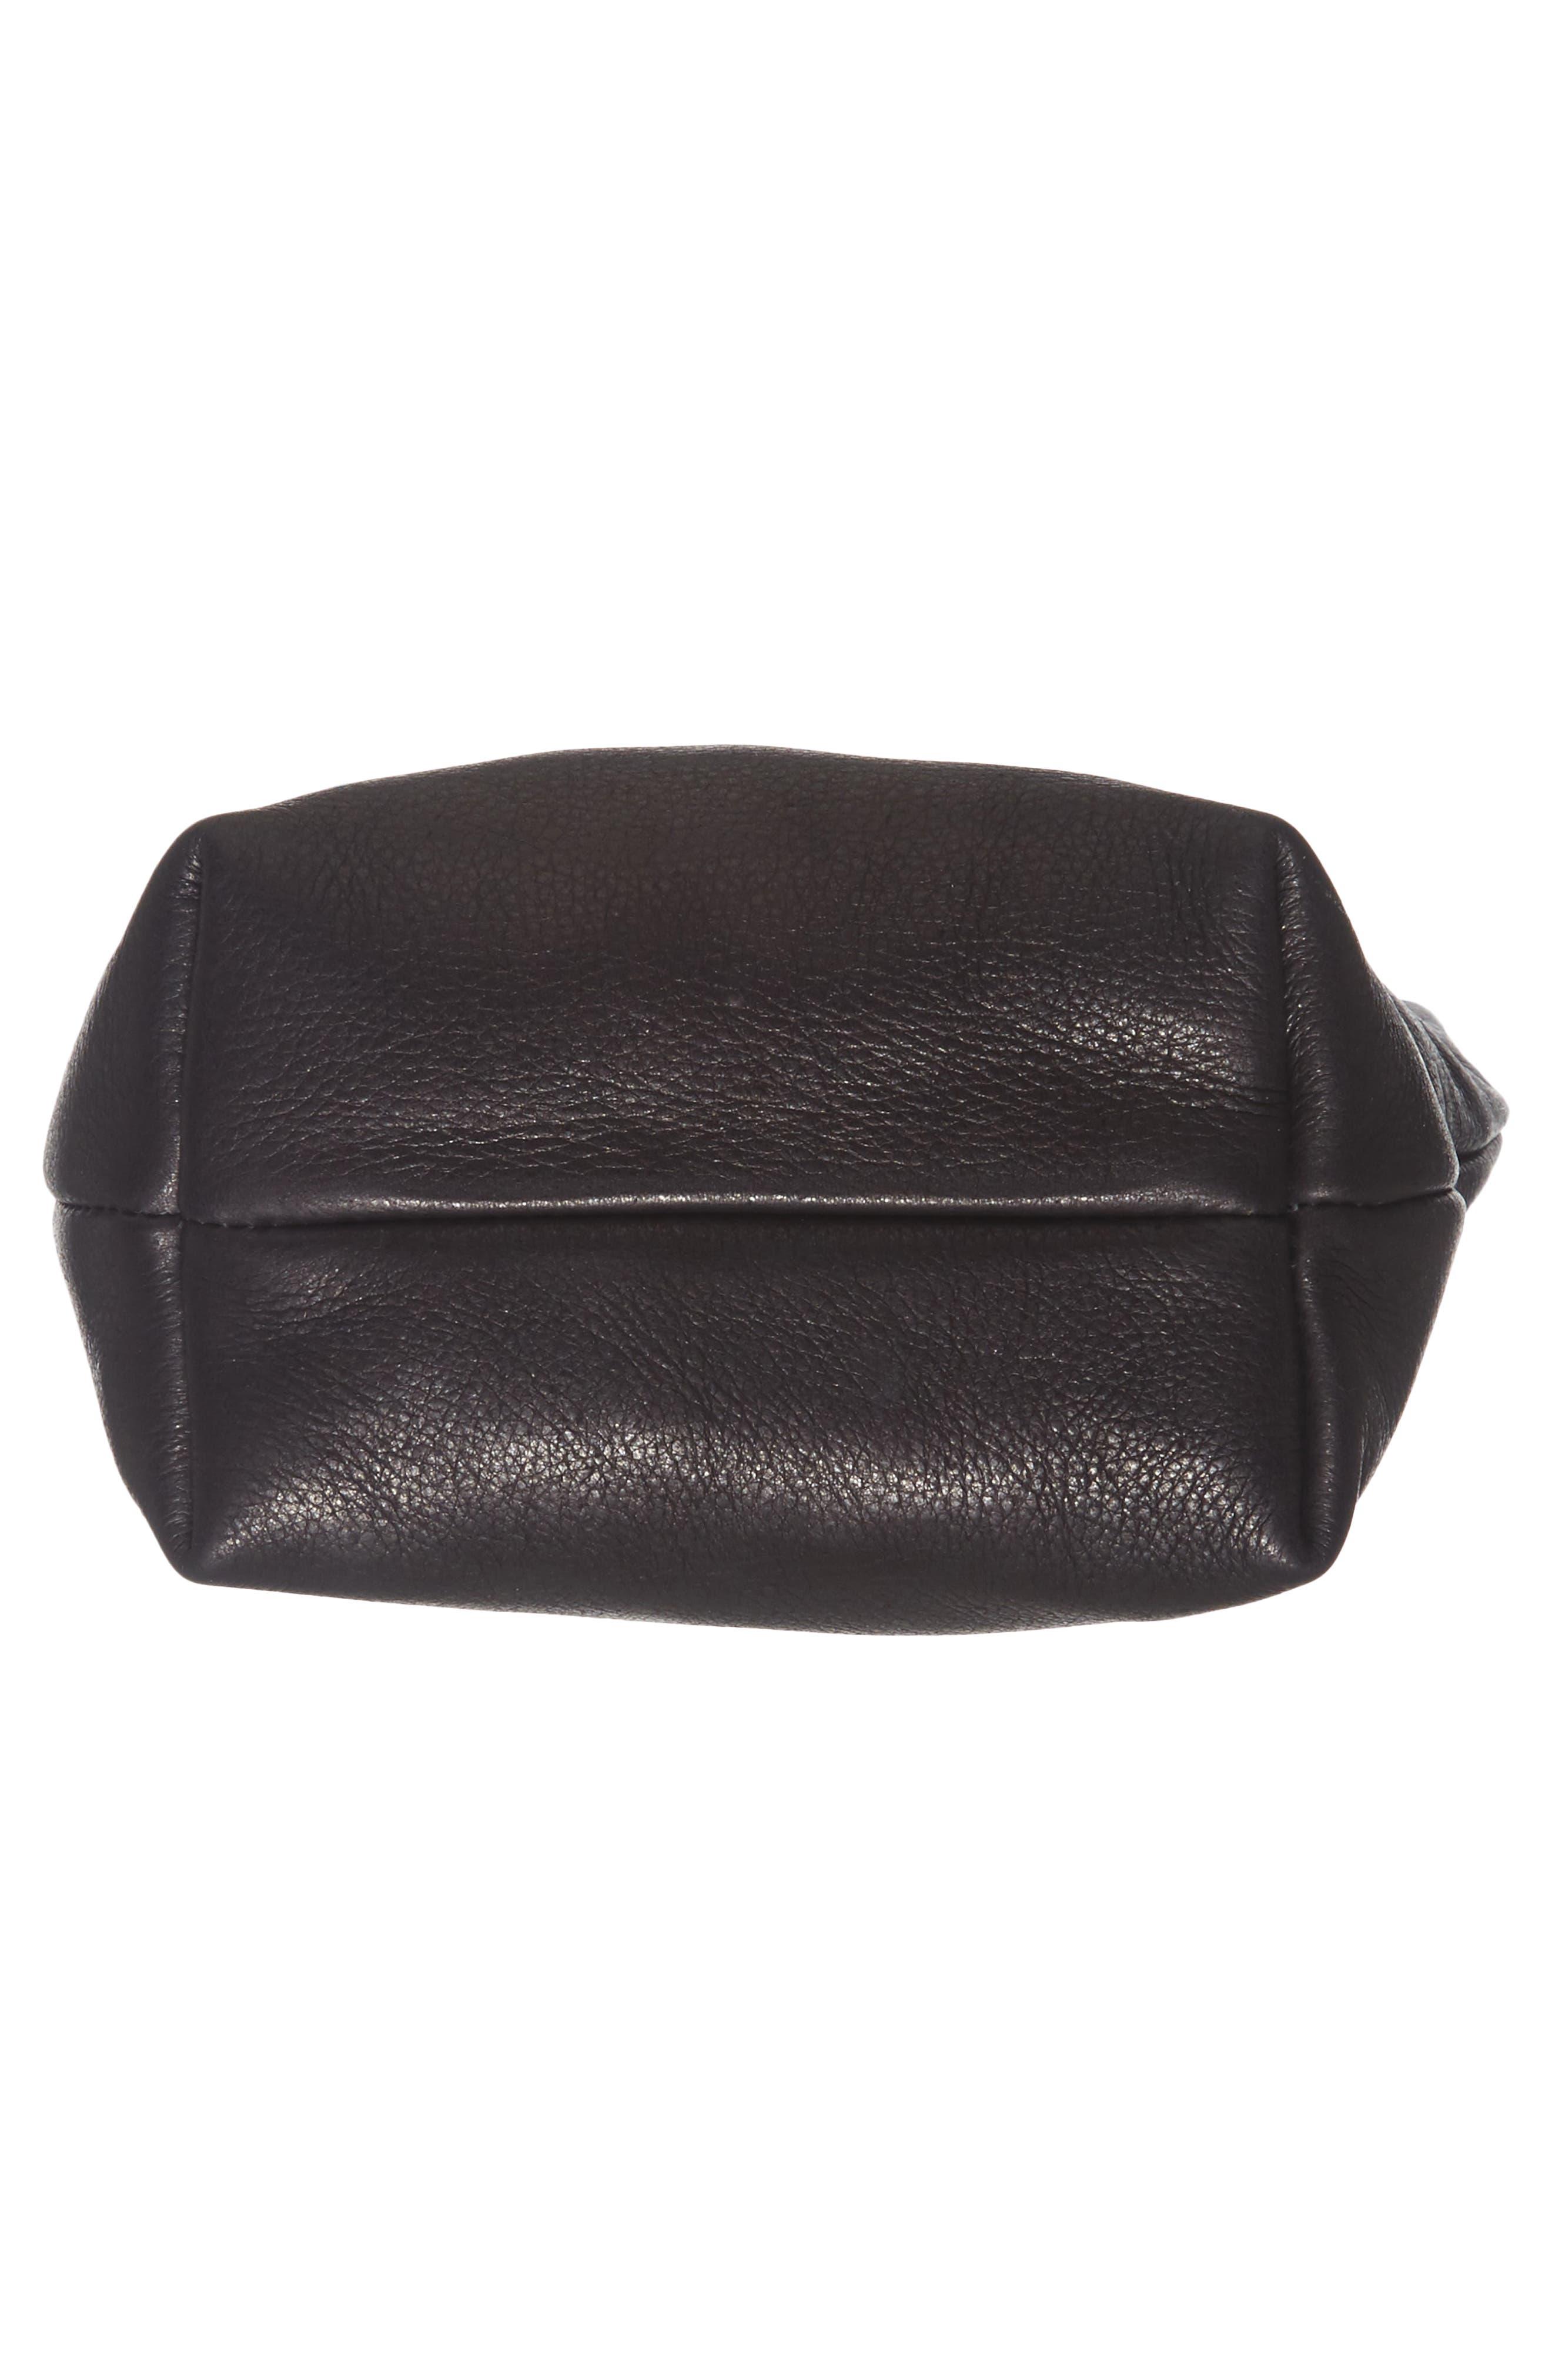 Leather Crossbody Bag,                             Alternate thumbnail 5, color,                             Black